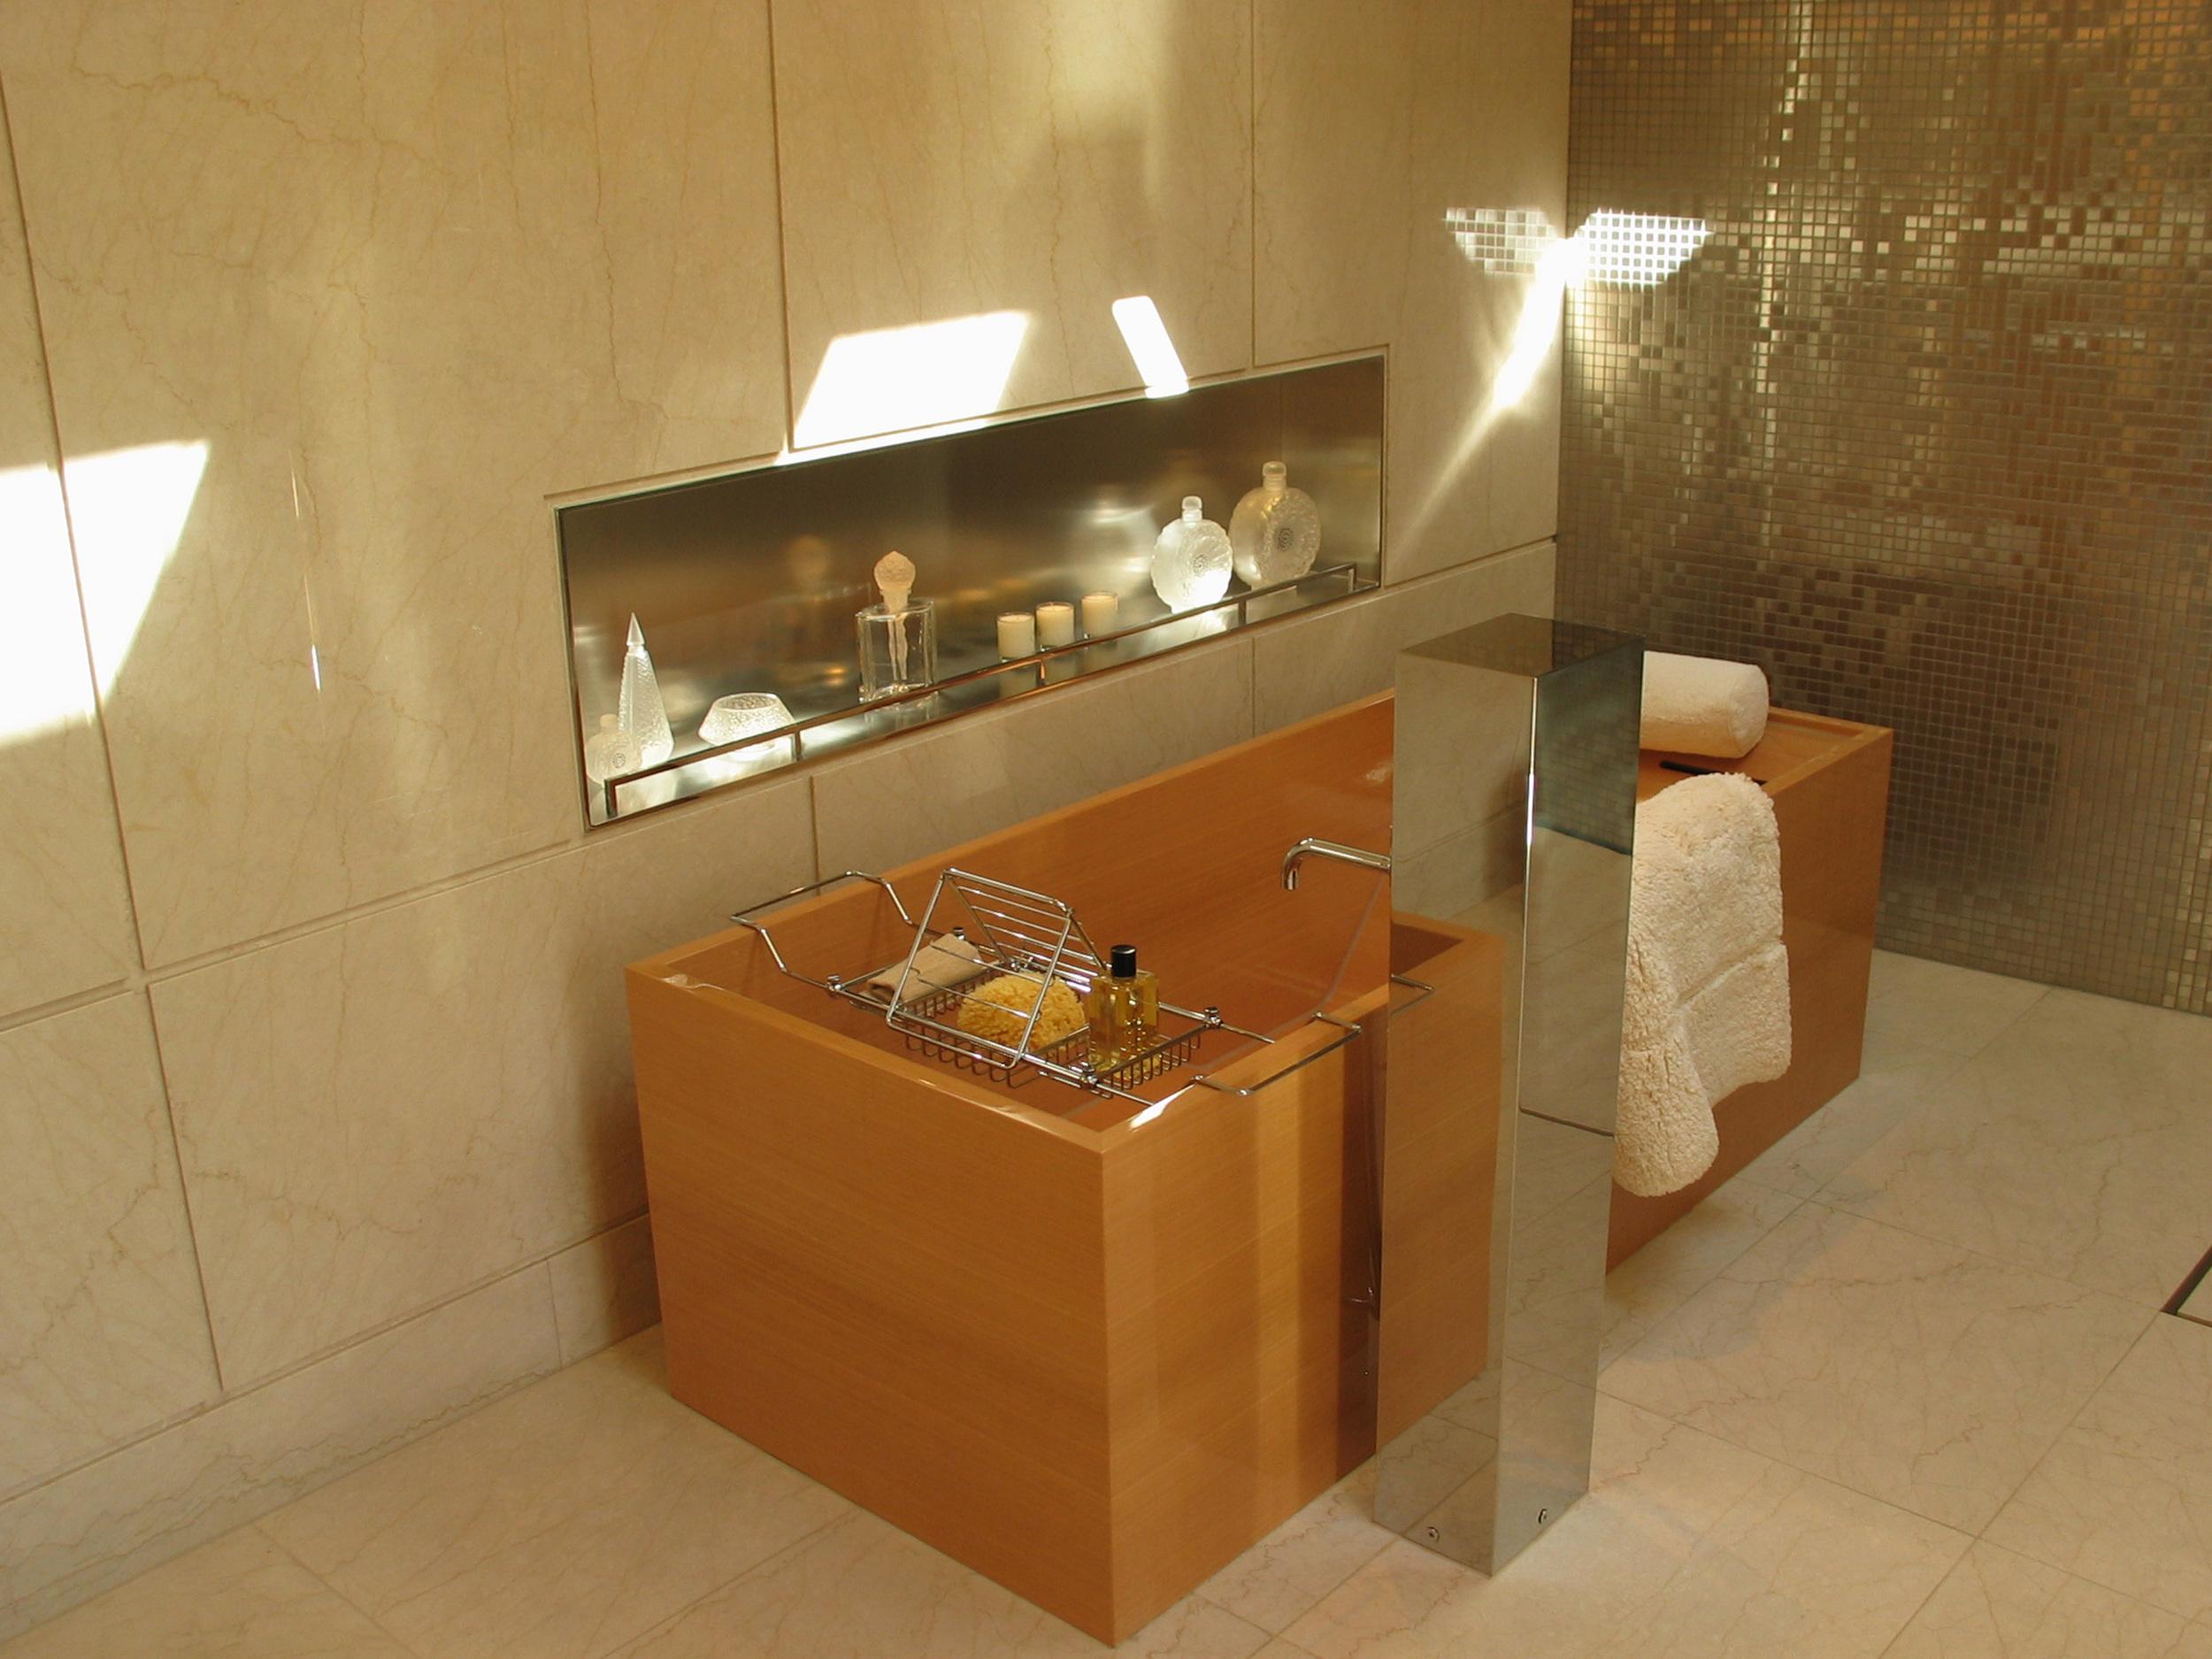 Motor Yacht 1 - Rising Sun - Bathroom Tub.jpg